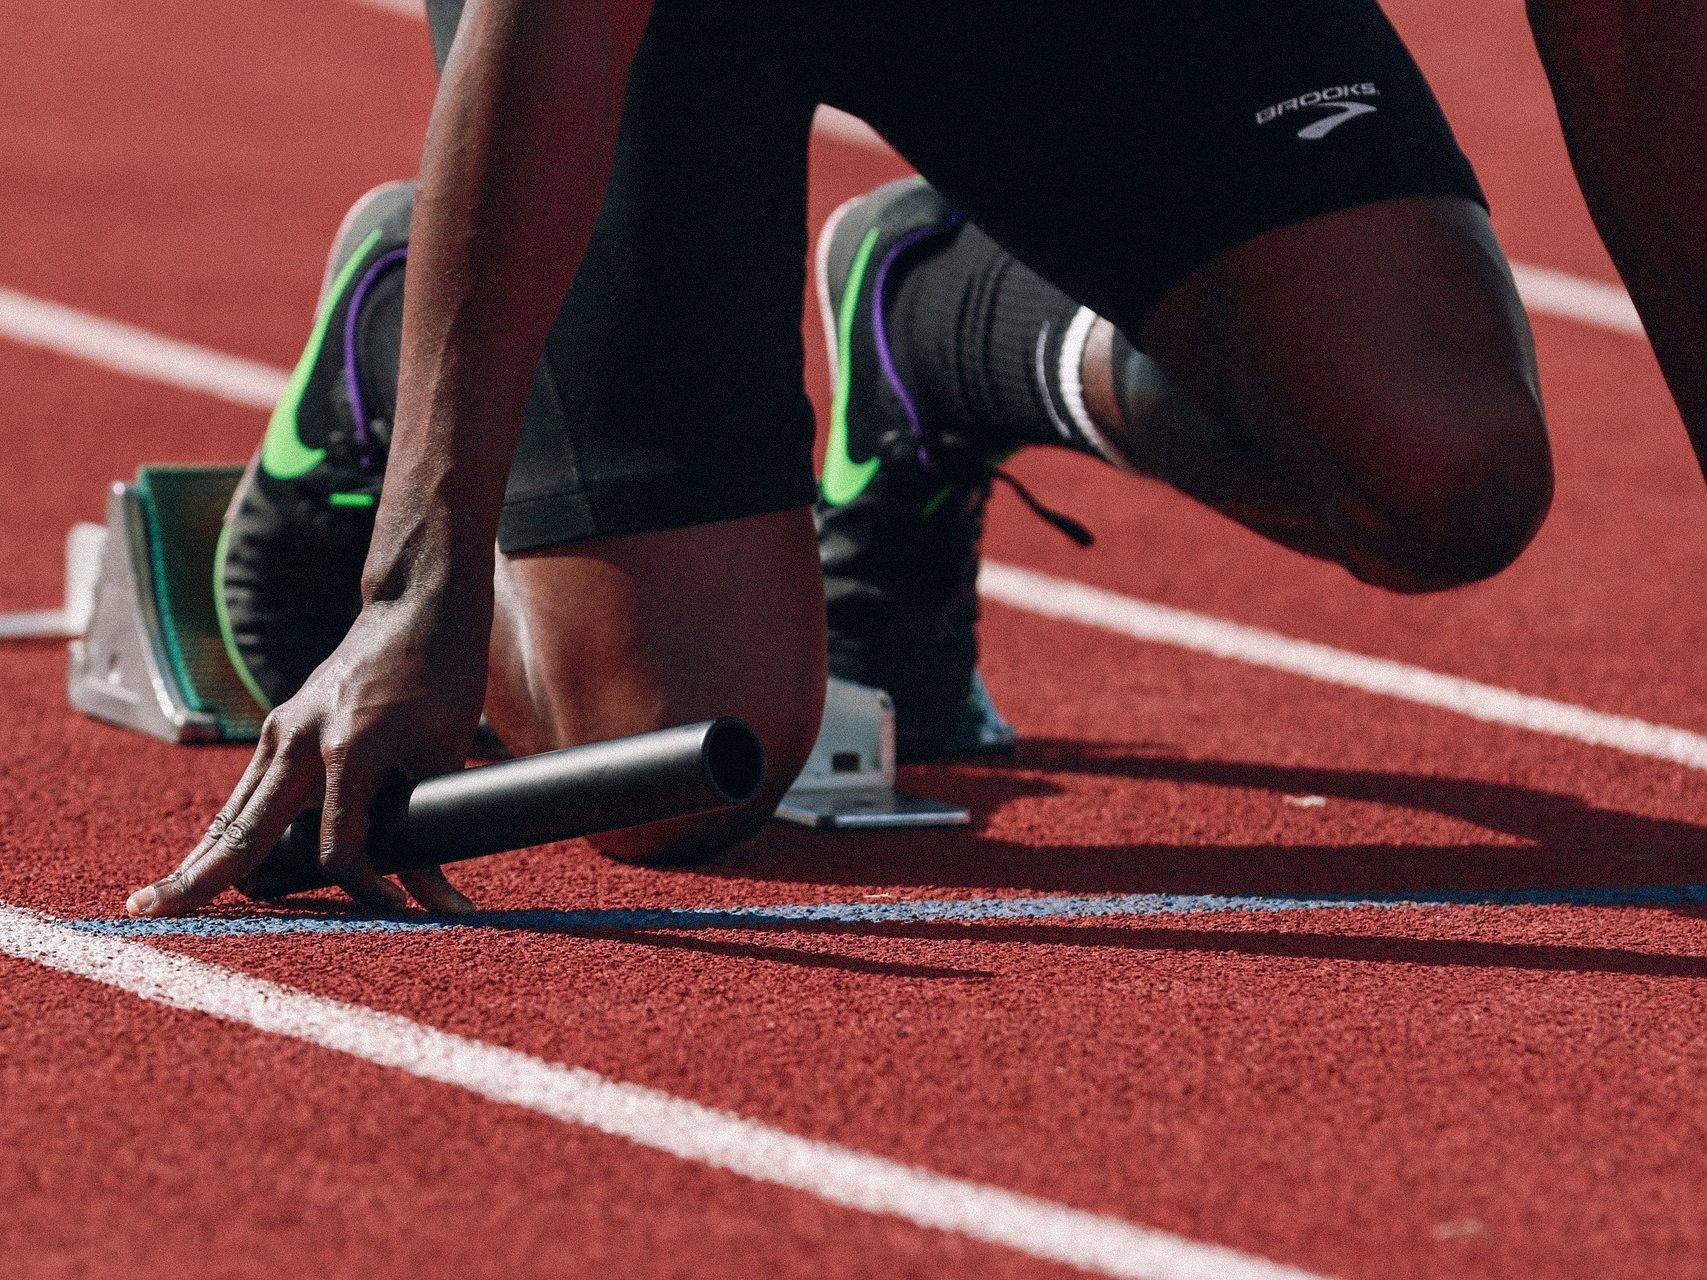 athlete-1840437_1920.jpg